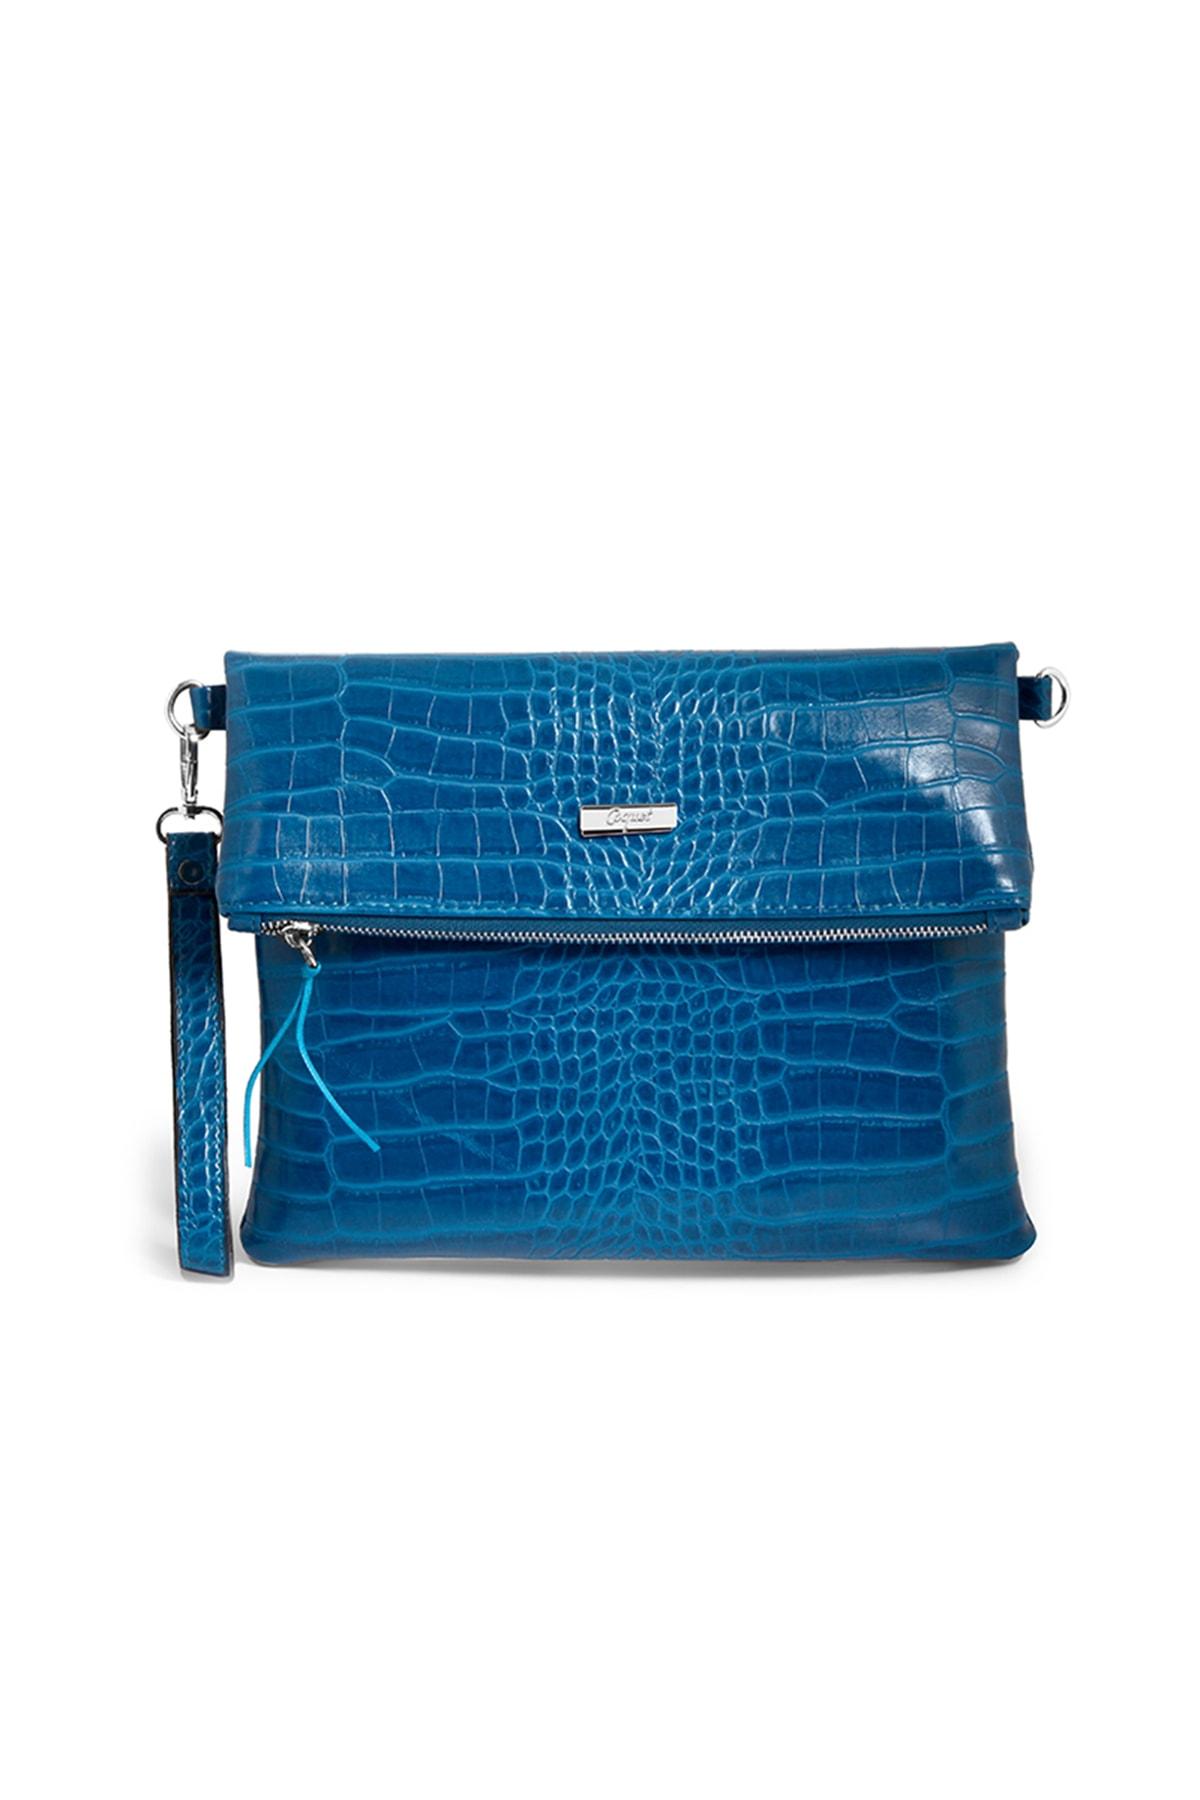 Coquet Accessories Kadın Koyu mavi Black Clutch 19G3U13N355 1